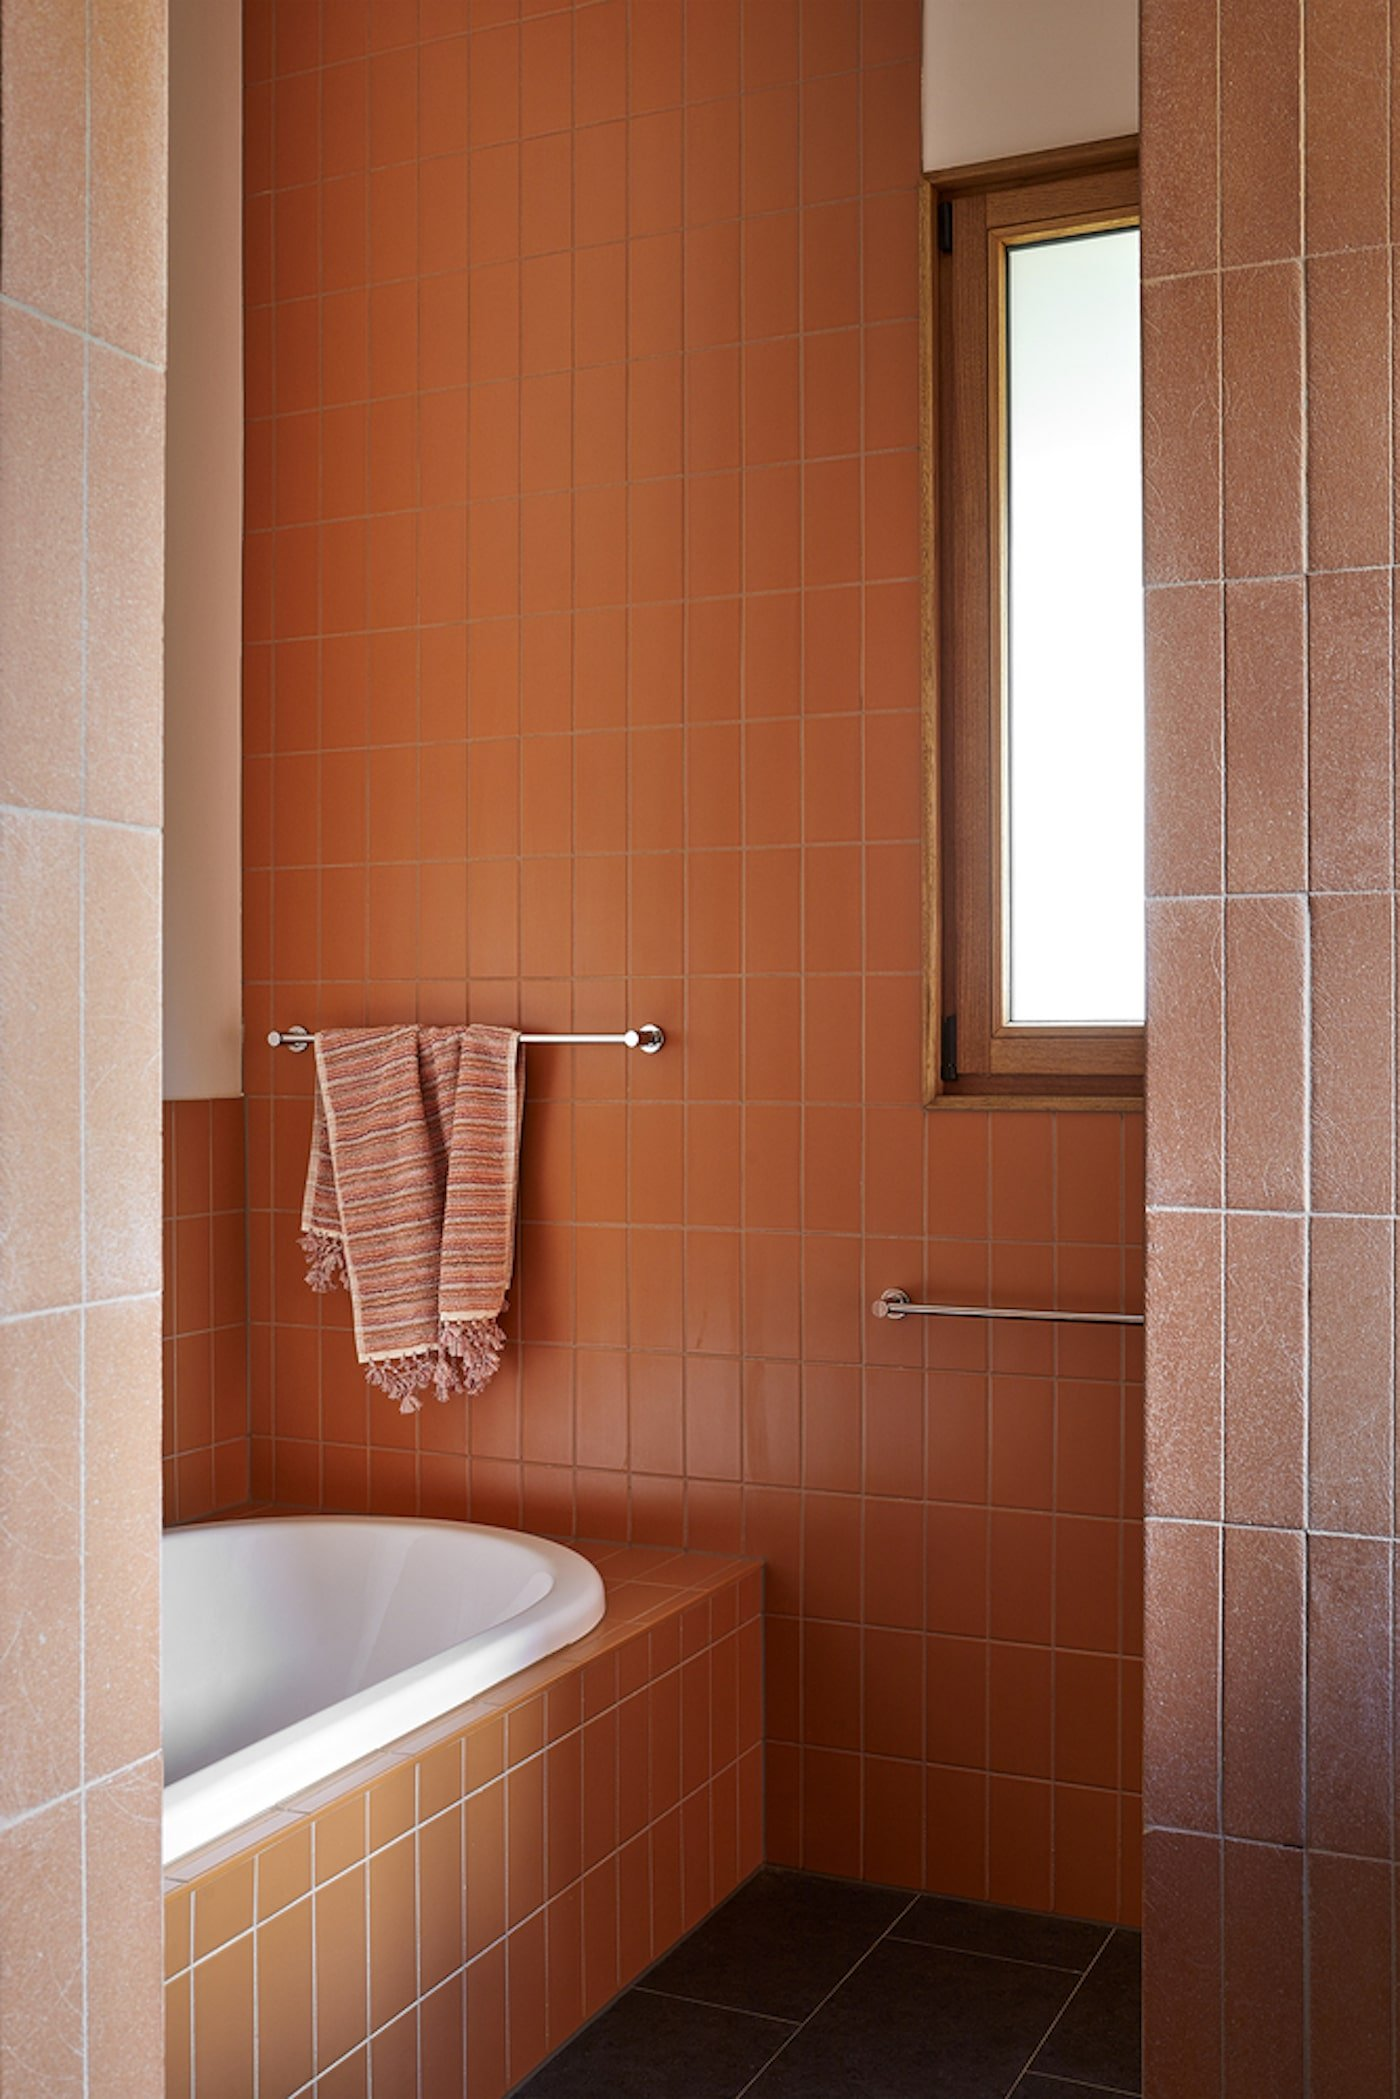 Eco Edition_MRTN Architects_Good Life House_Architecture interiors 3-min